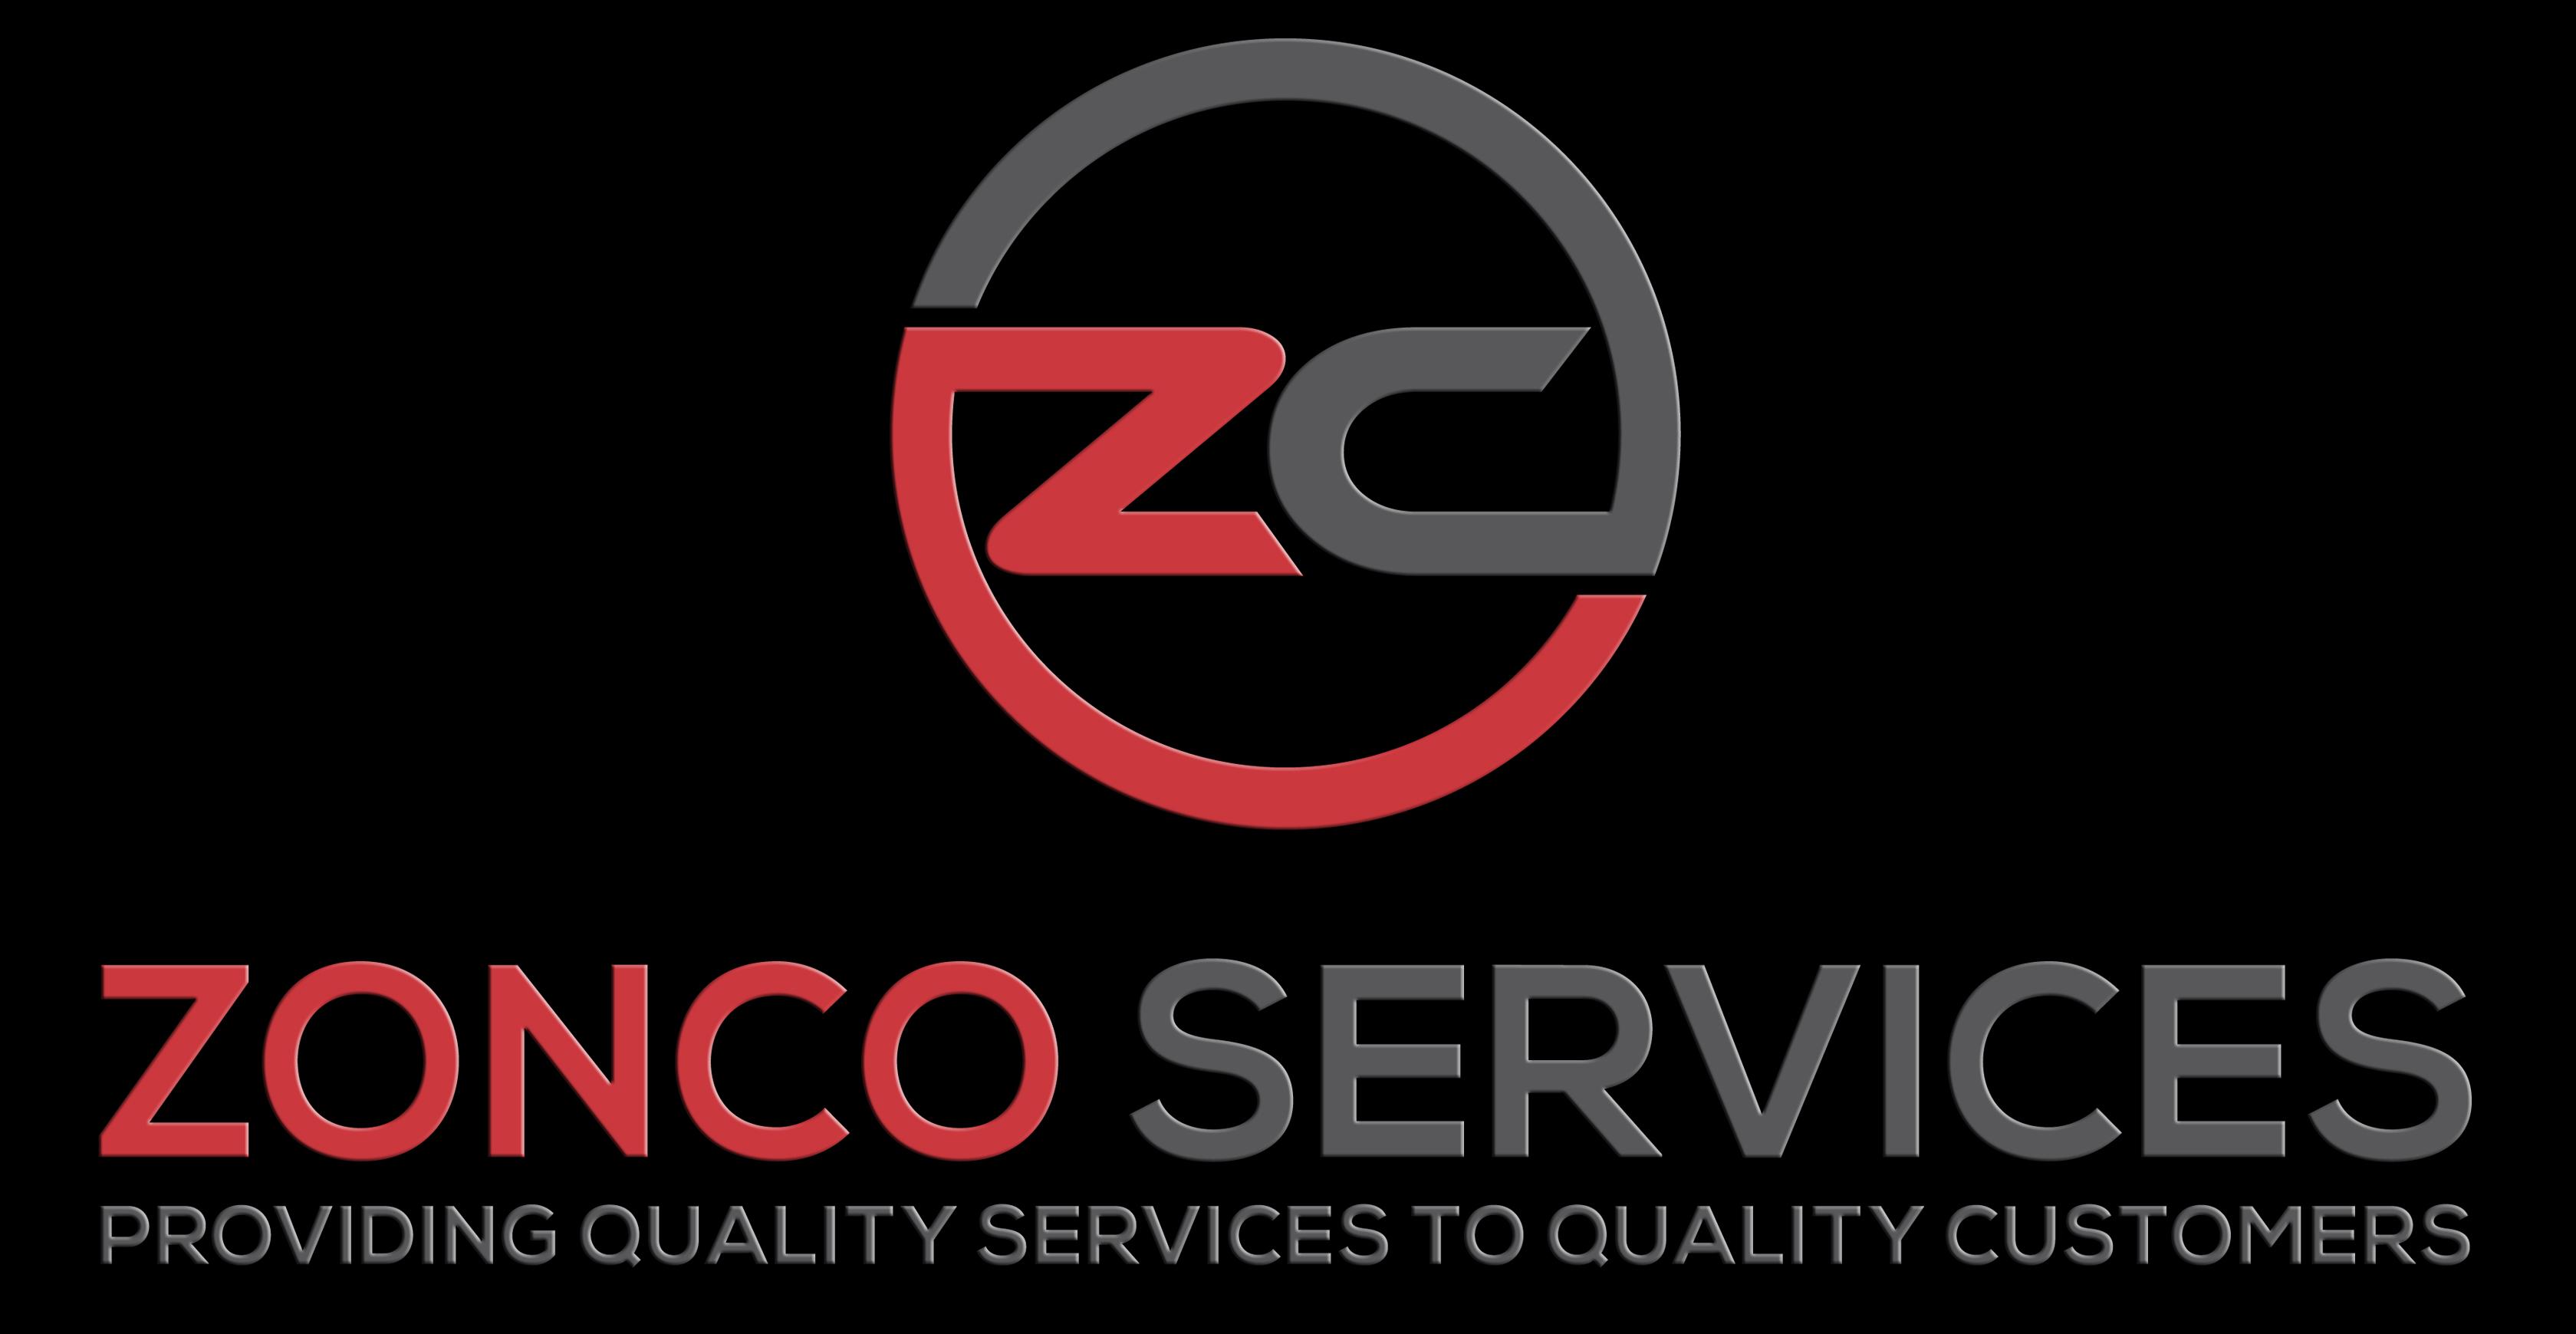 ZONCO SERVICES LOGO Black background